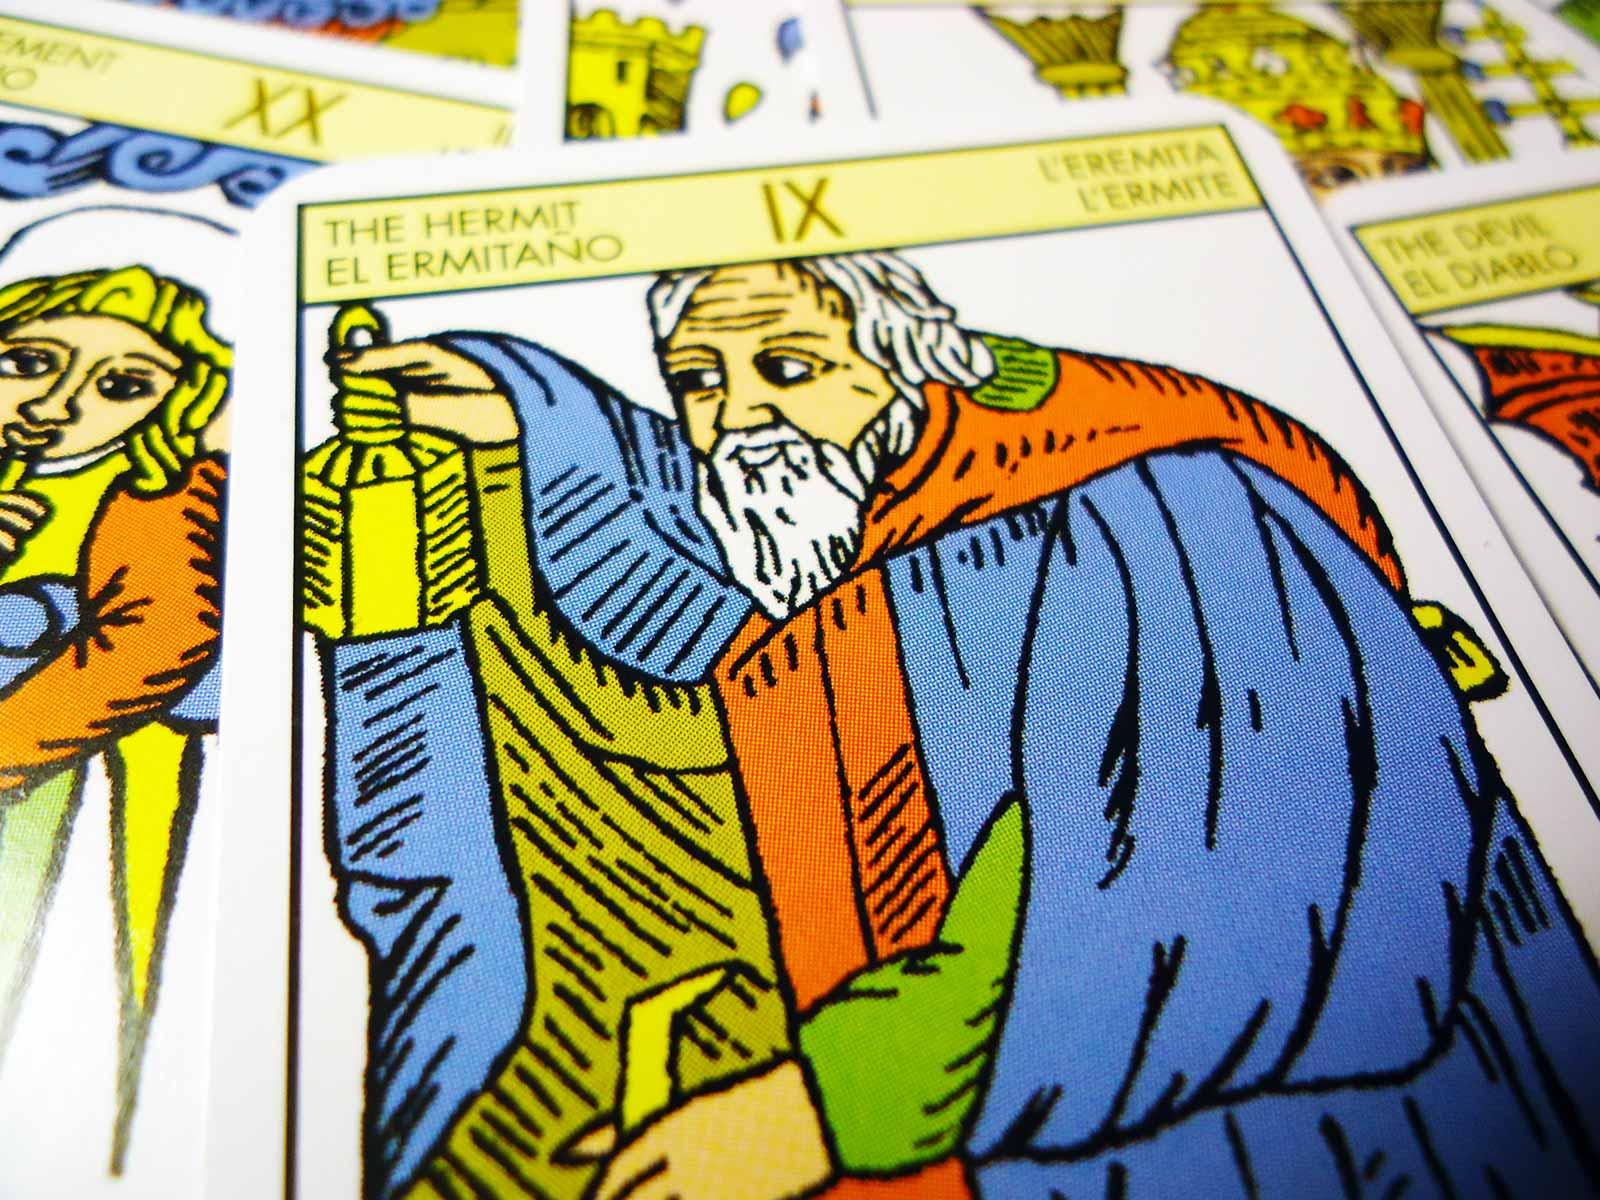 The Hermit - tarot card, Tarot De Marseille